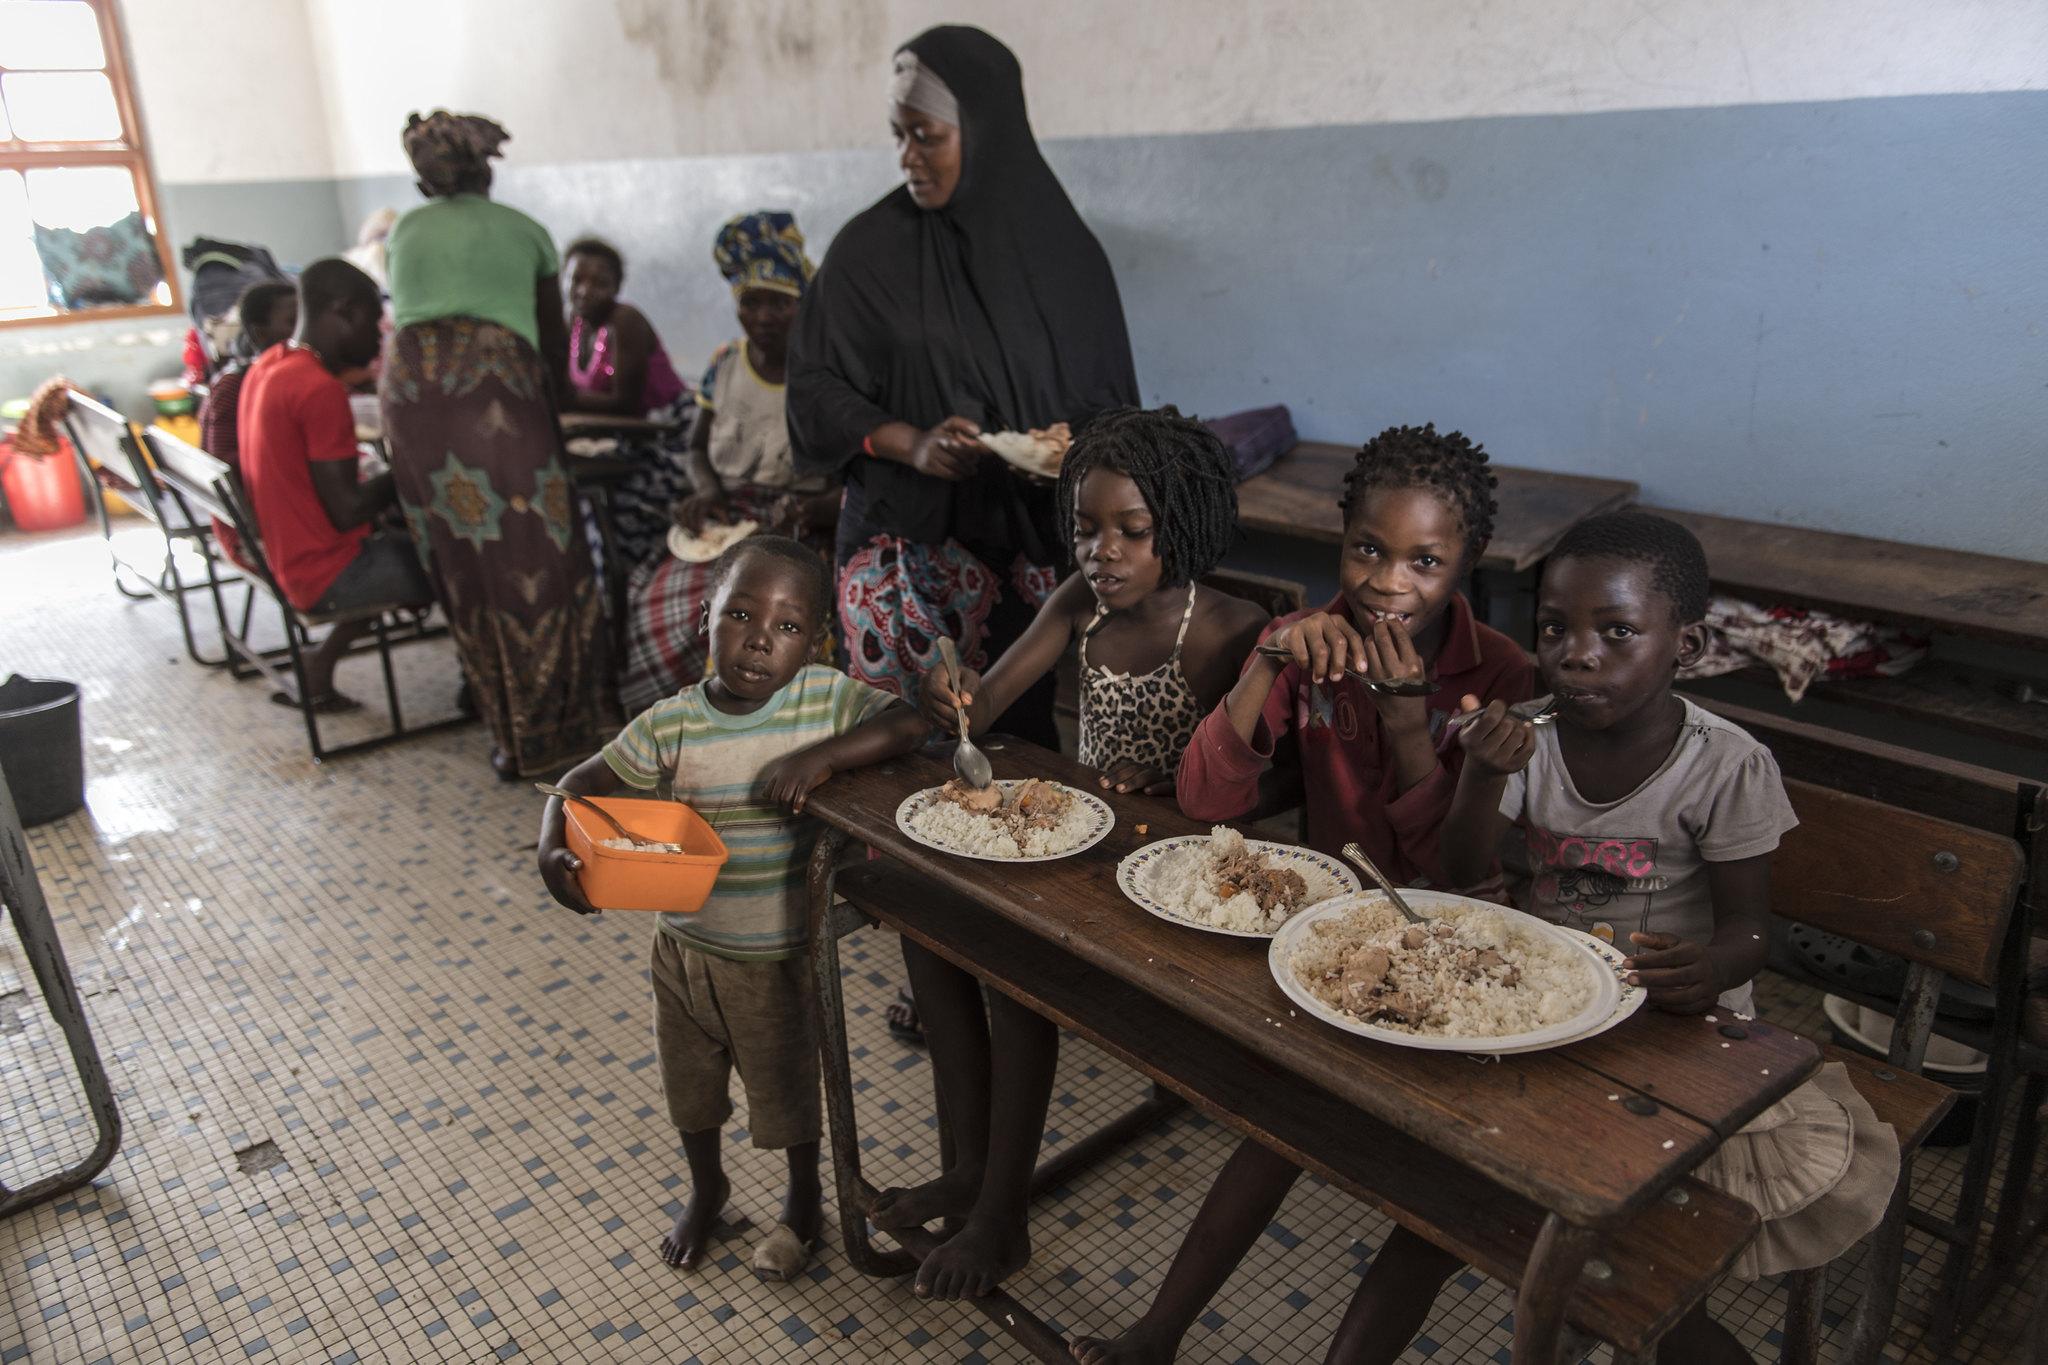 Free school meals 'could help child brain development'